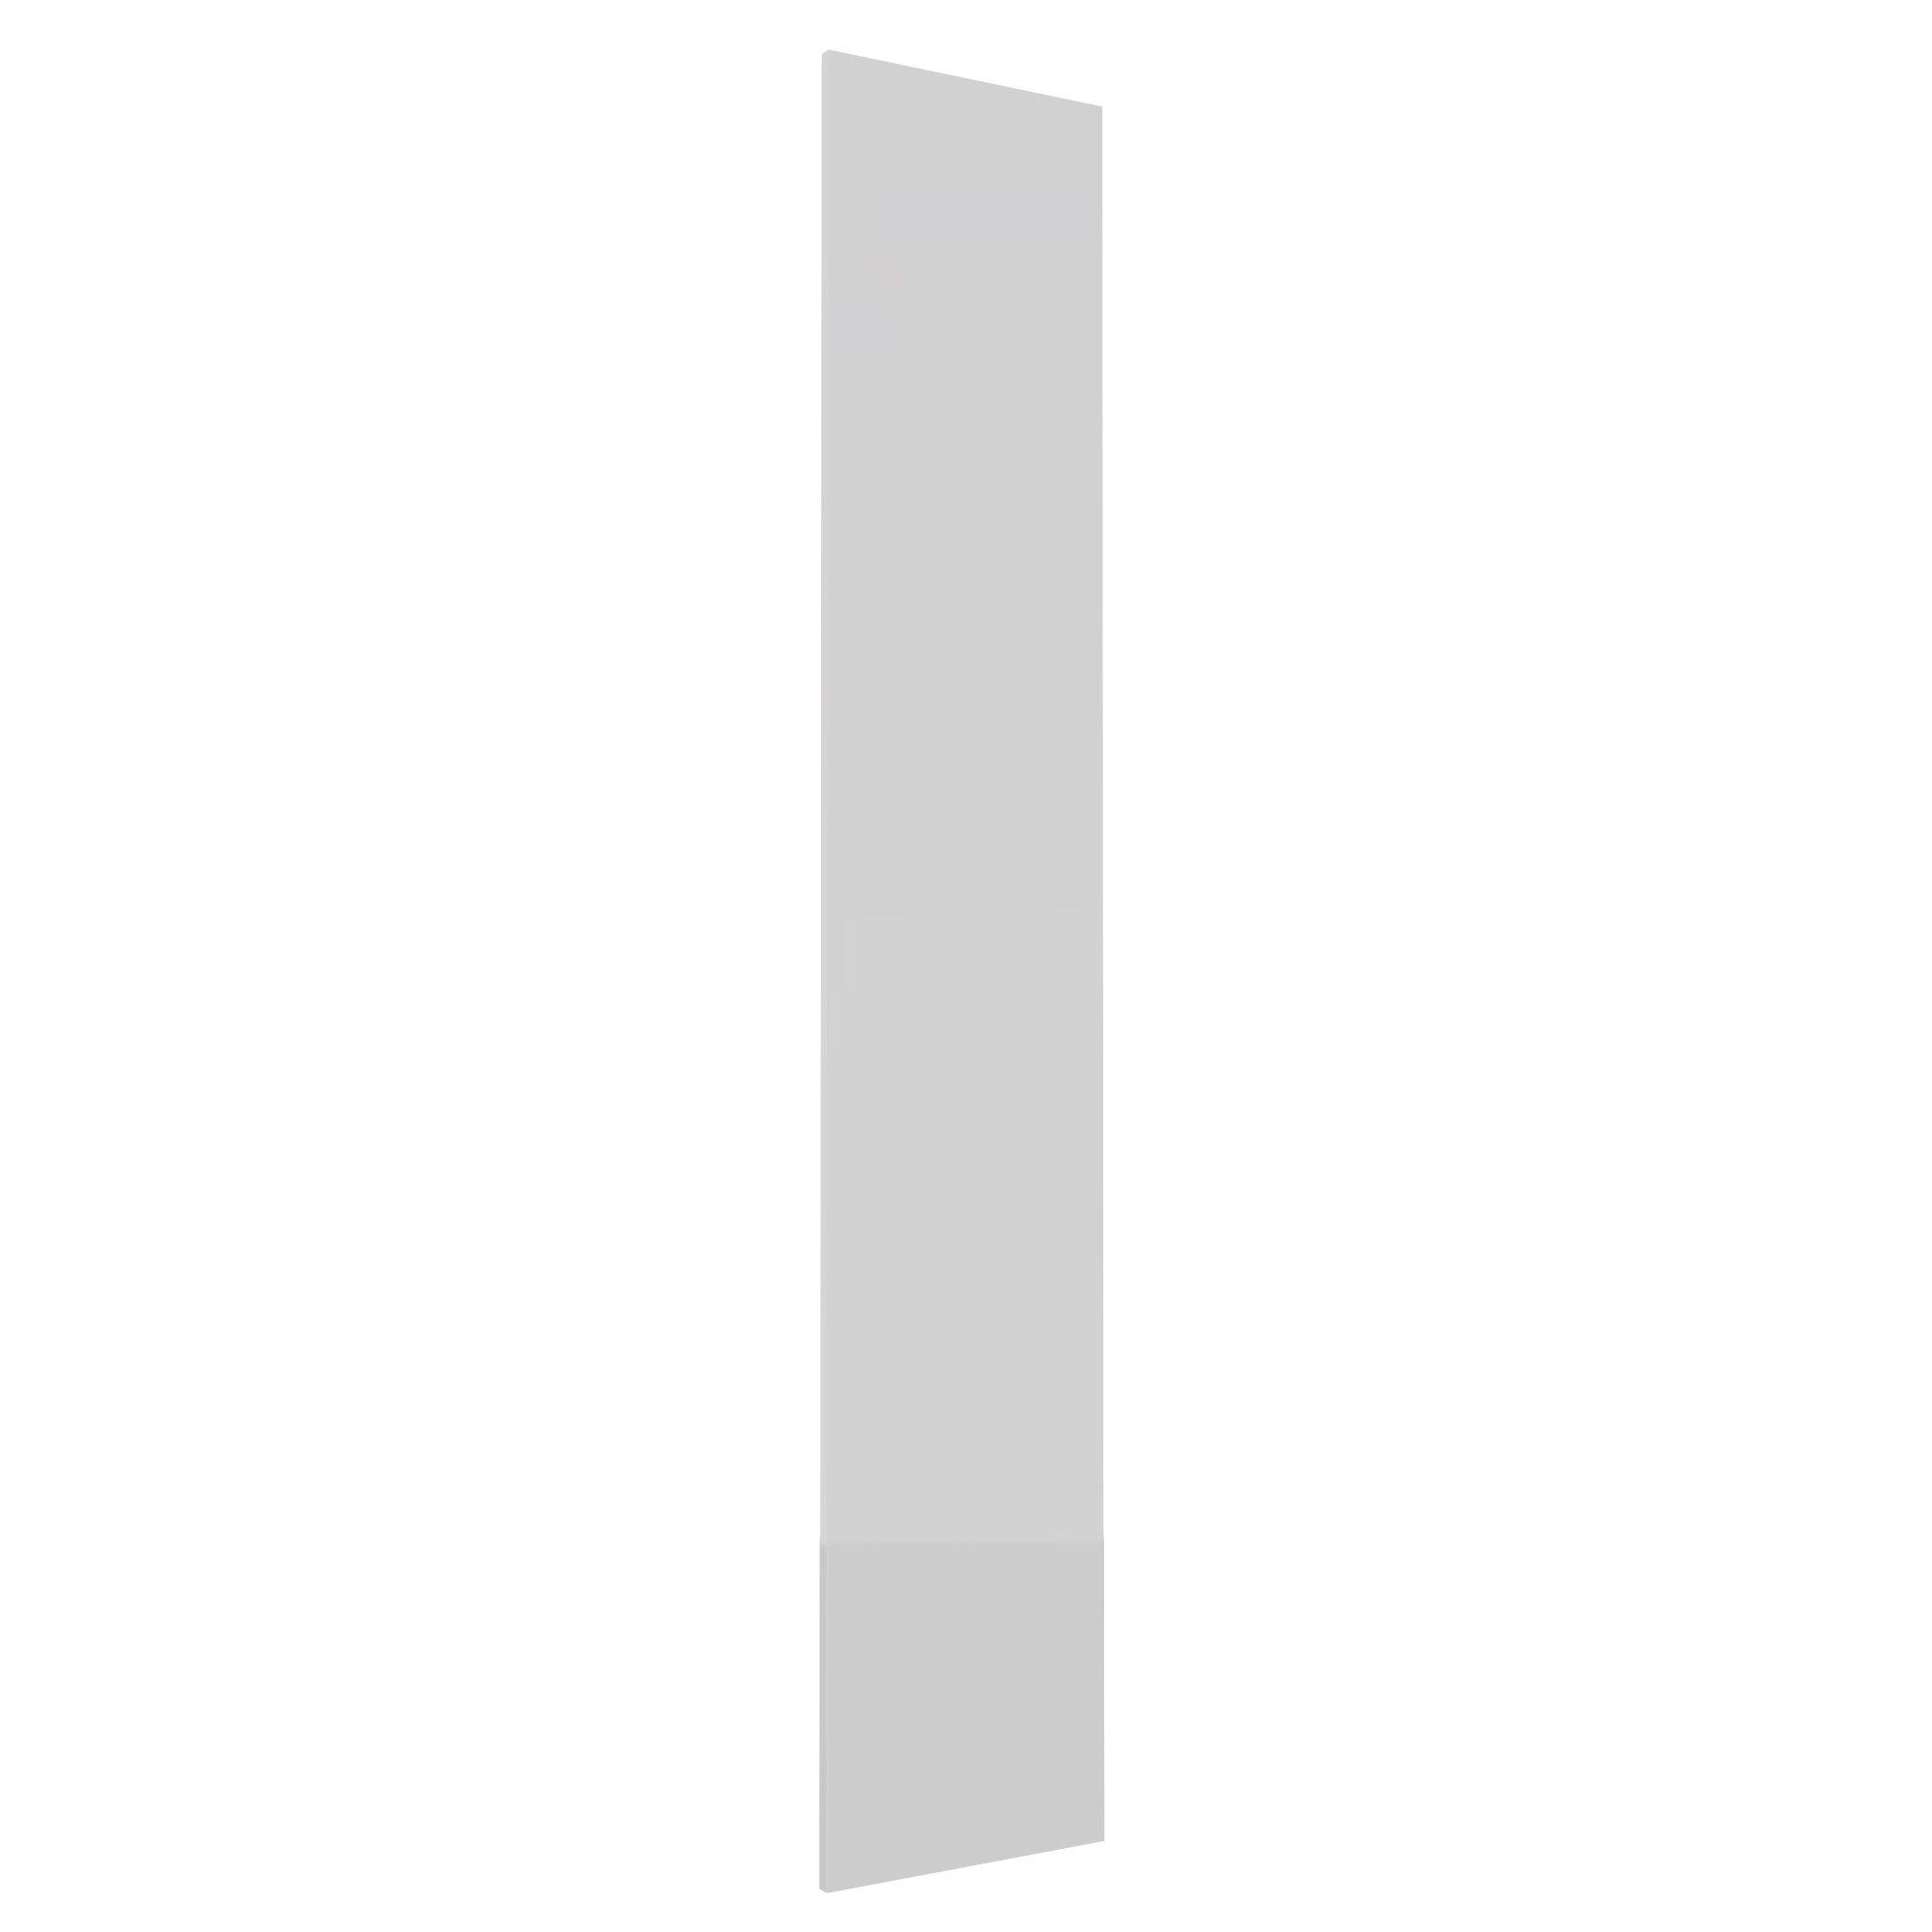 Darwin Modular White & Gloss Tall Wardrobe Door (h)2288mm (w)372mm (d)16mm